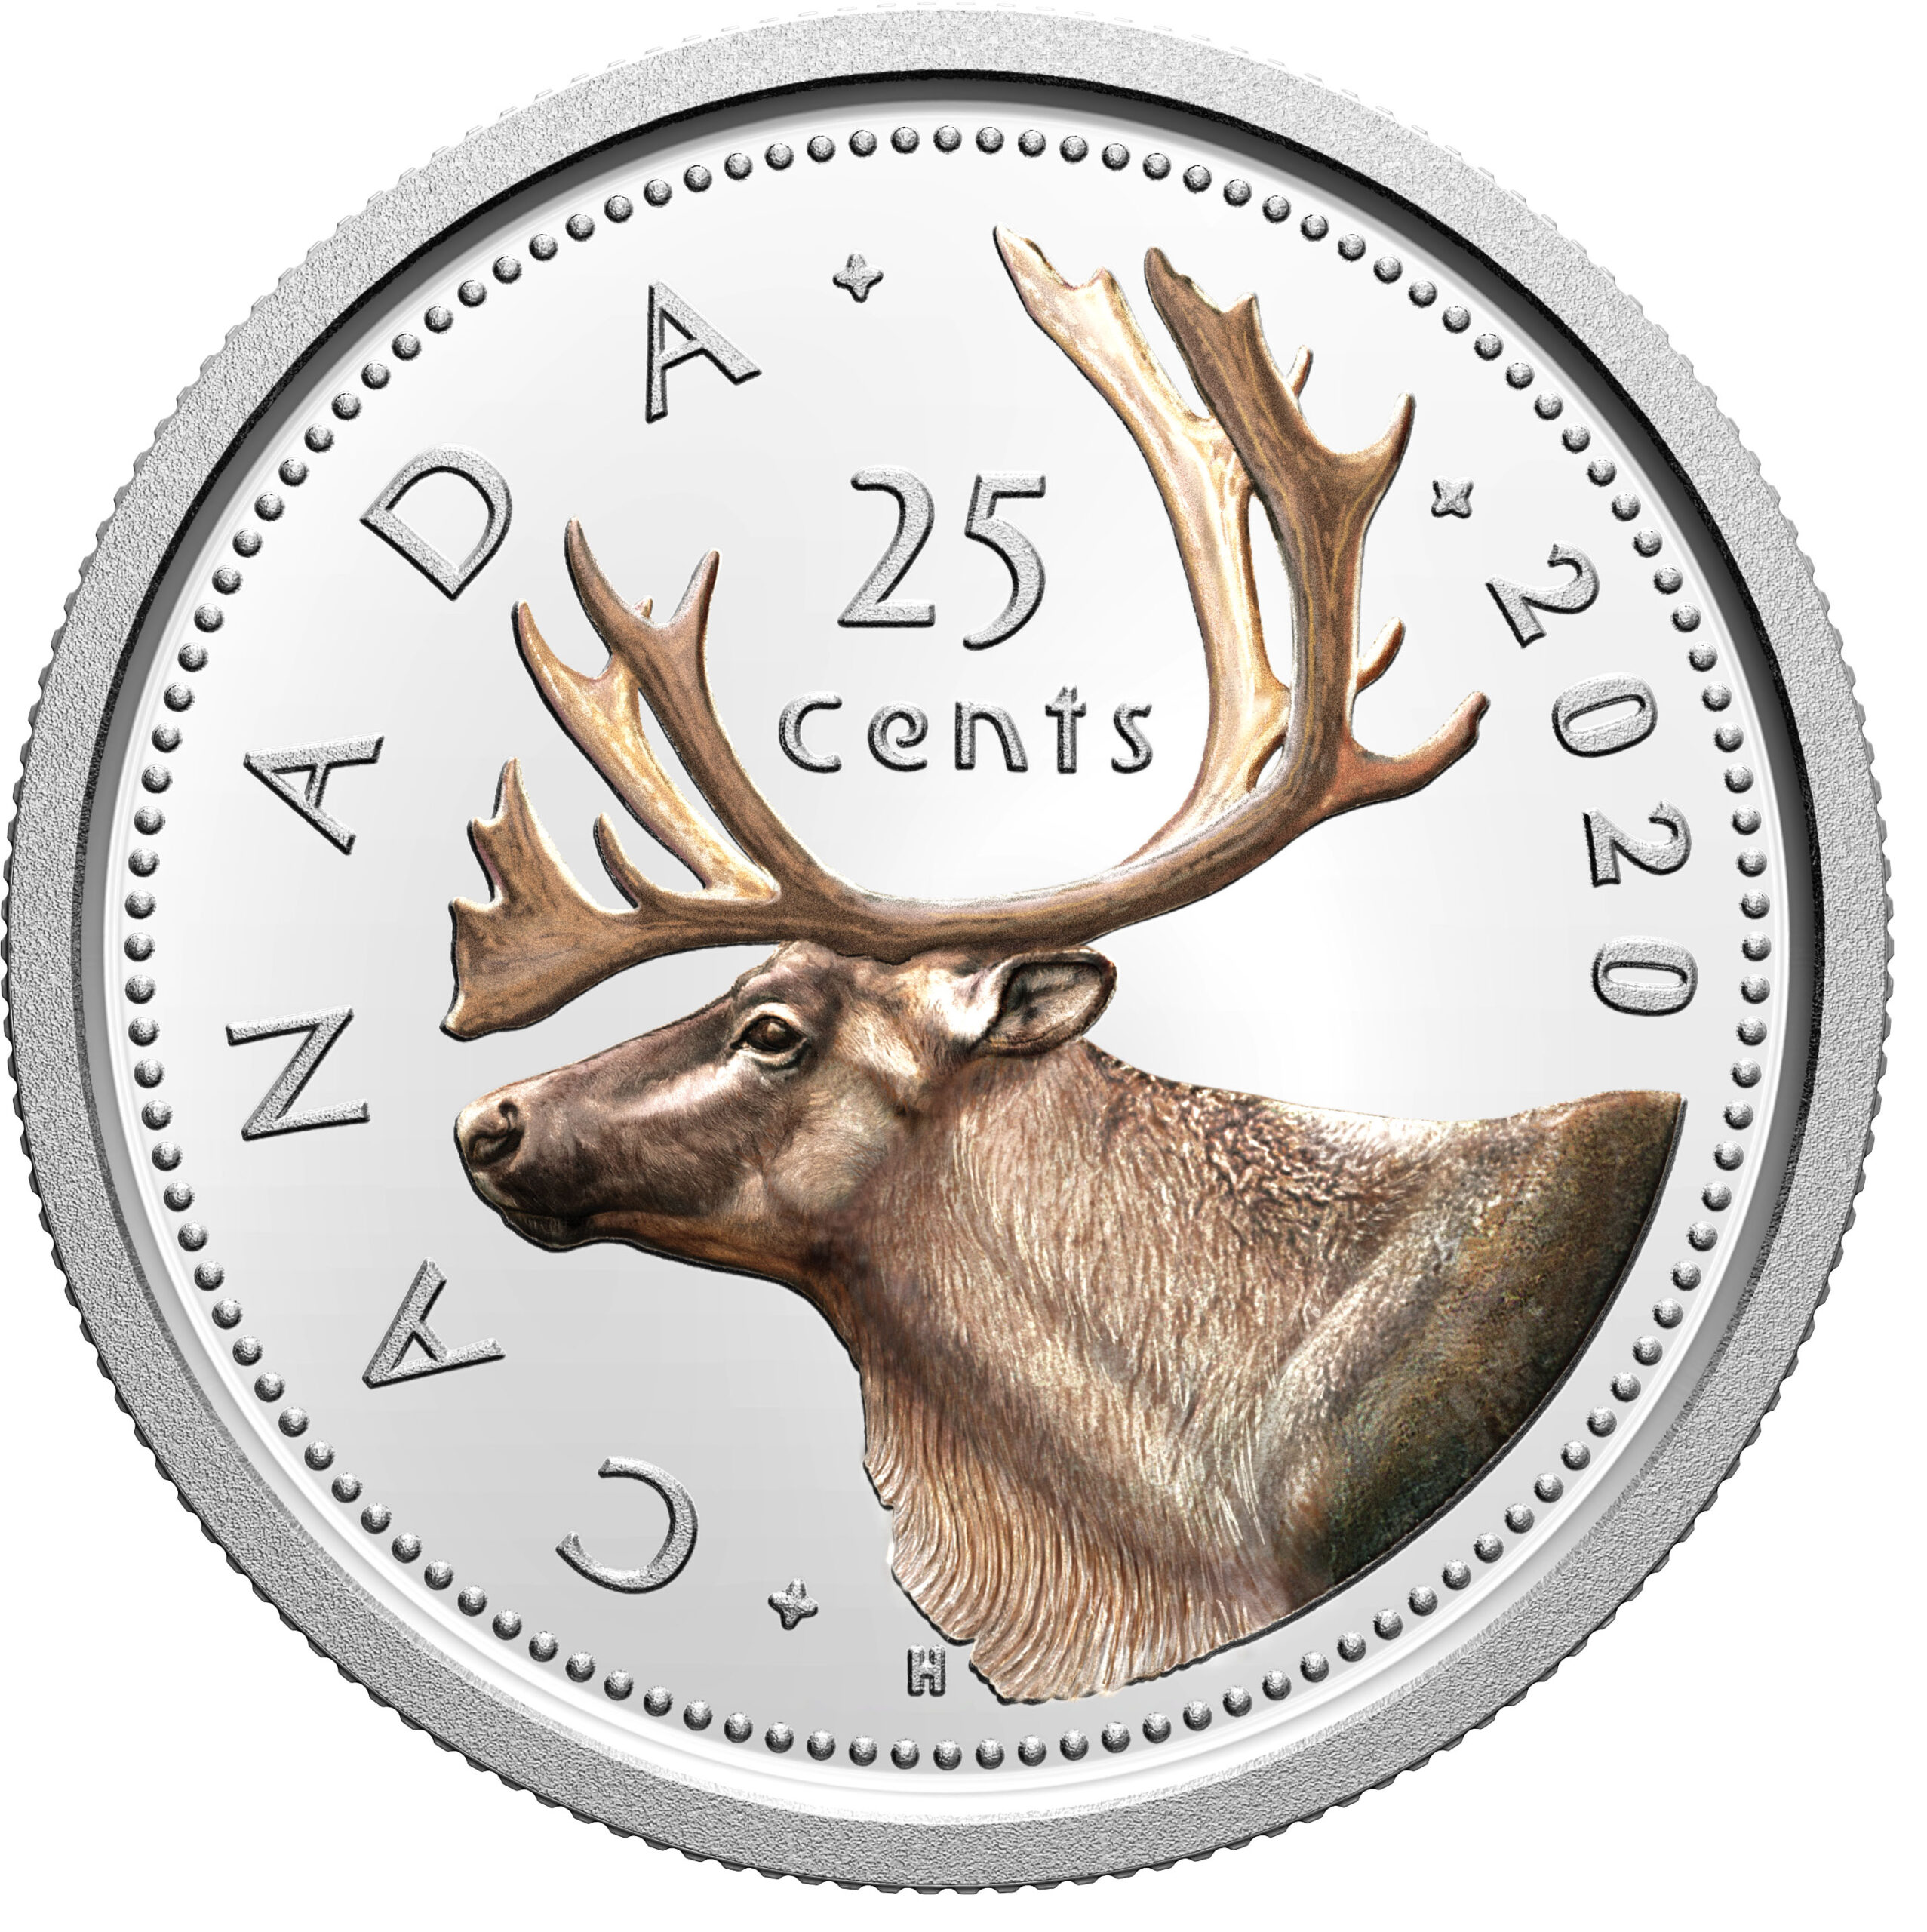 CA 25 Cents 2020